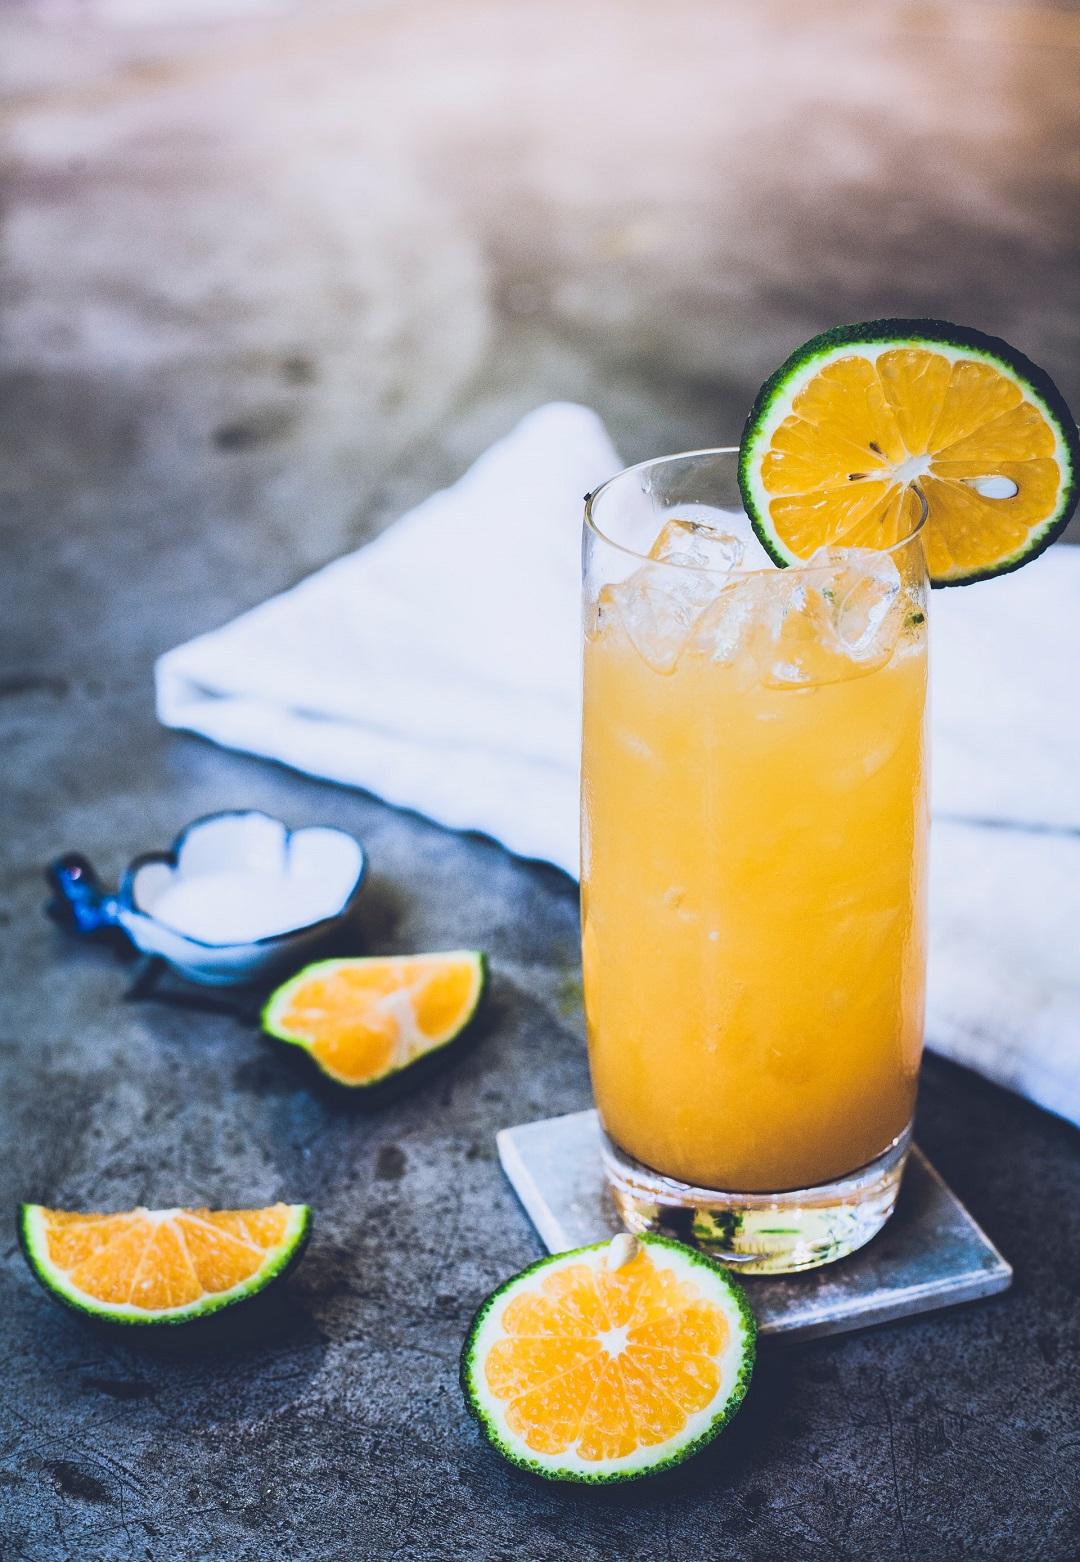 Fresh fruit juice vs. reconstituted fruit juice